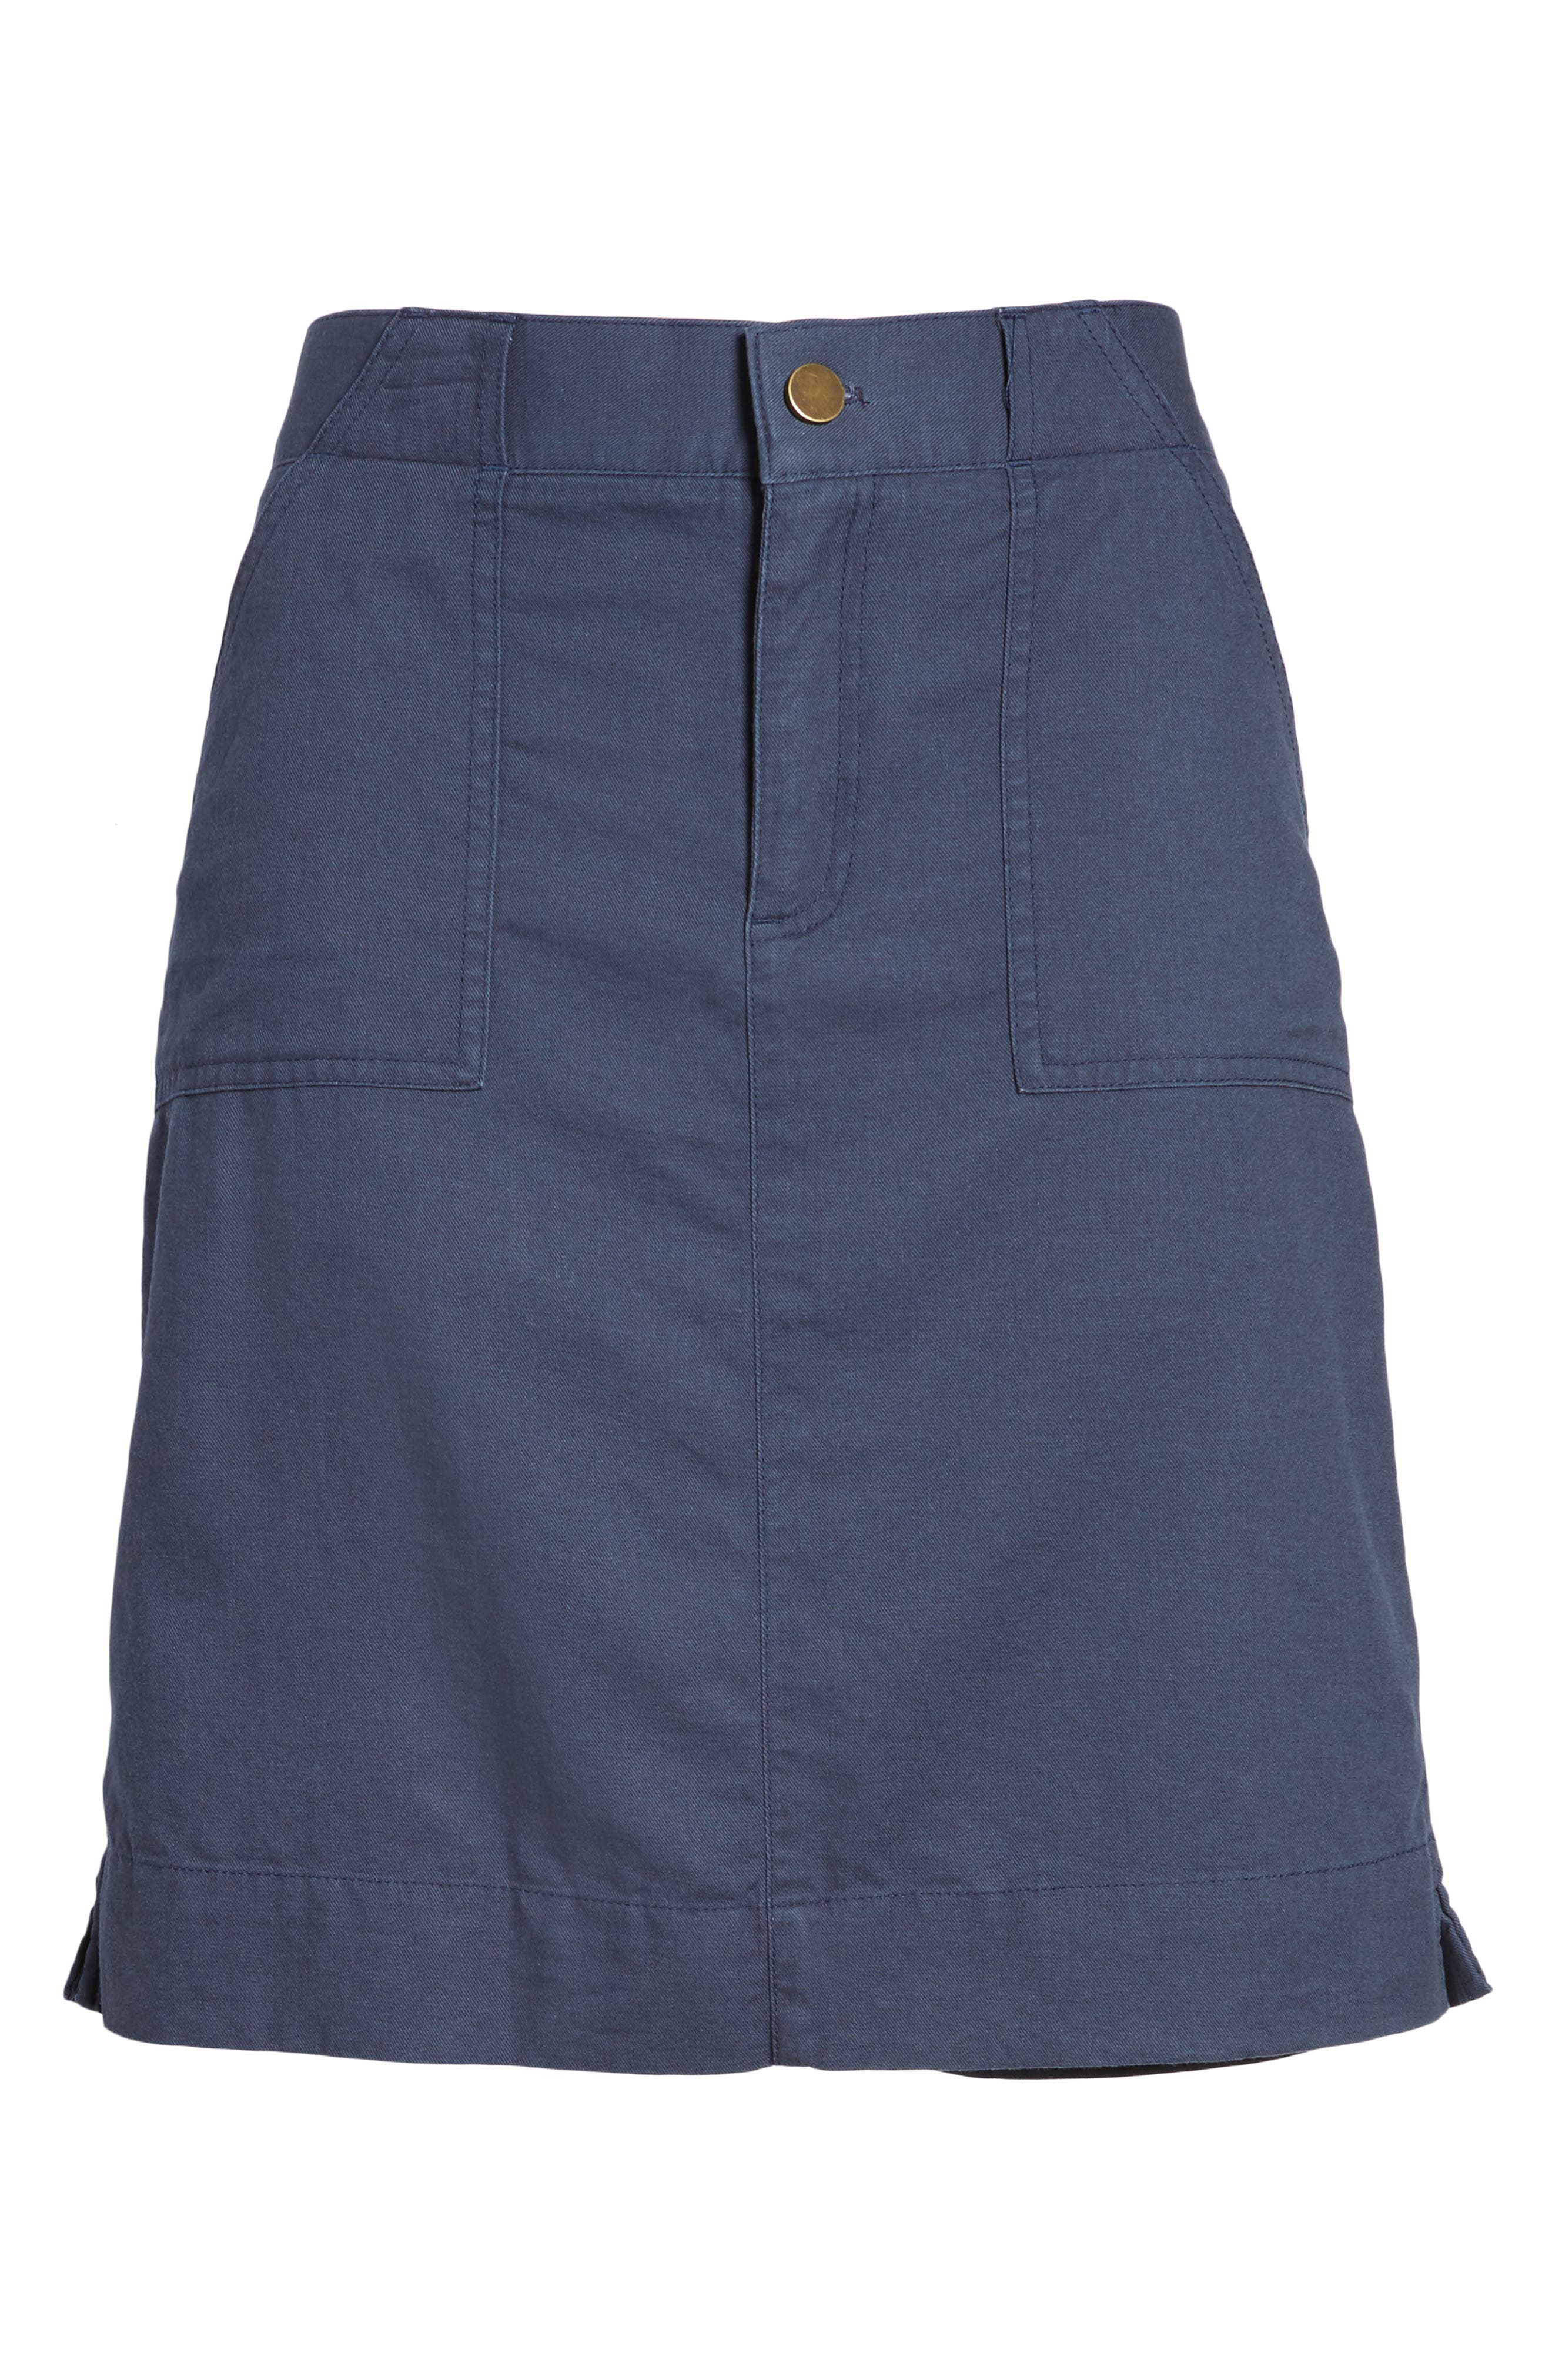 Twill Utility Skirt,                             Alternate thumbnail 6, color,                             Navy Indigo